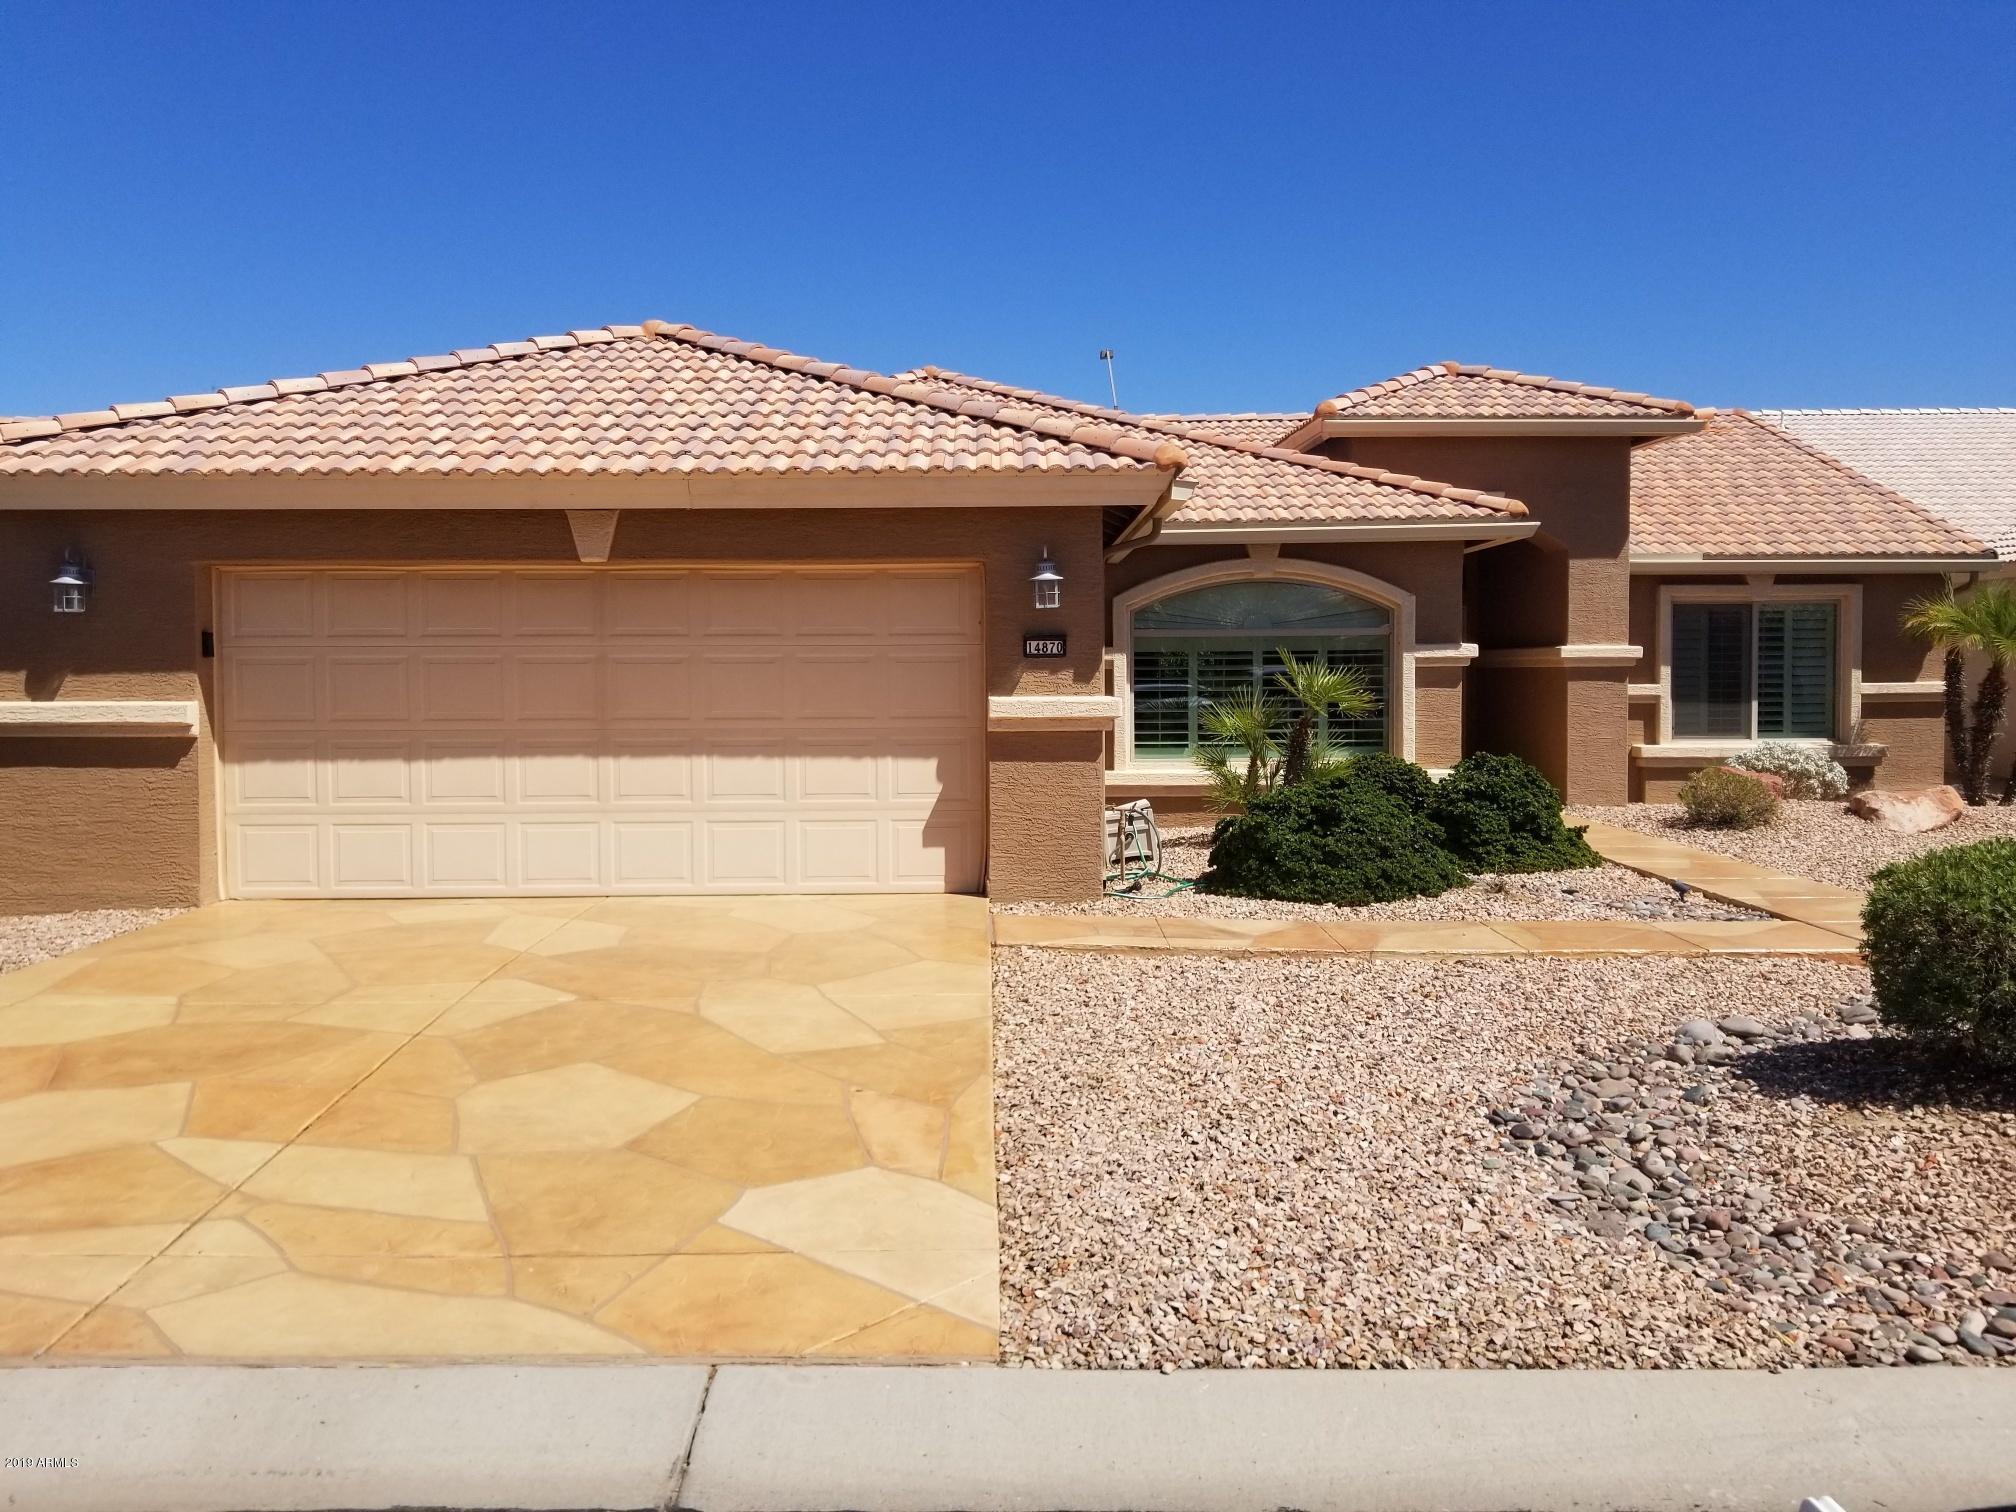 Photo of 14870 W PICCADILLY Road, Goodyear, AZ 85395